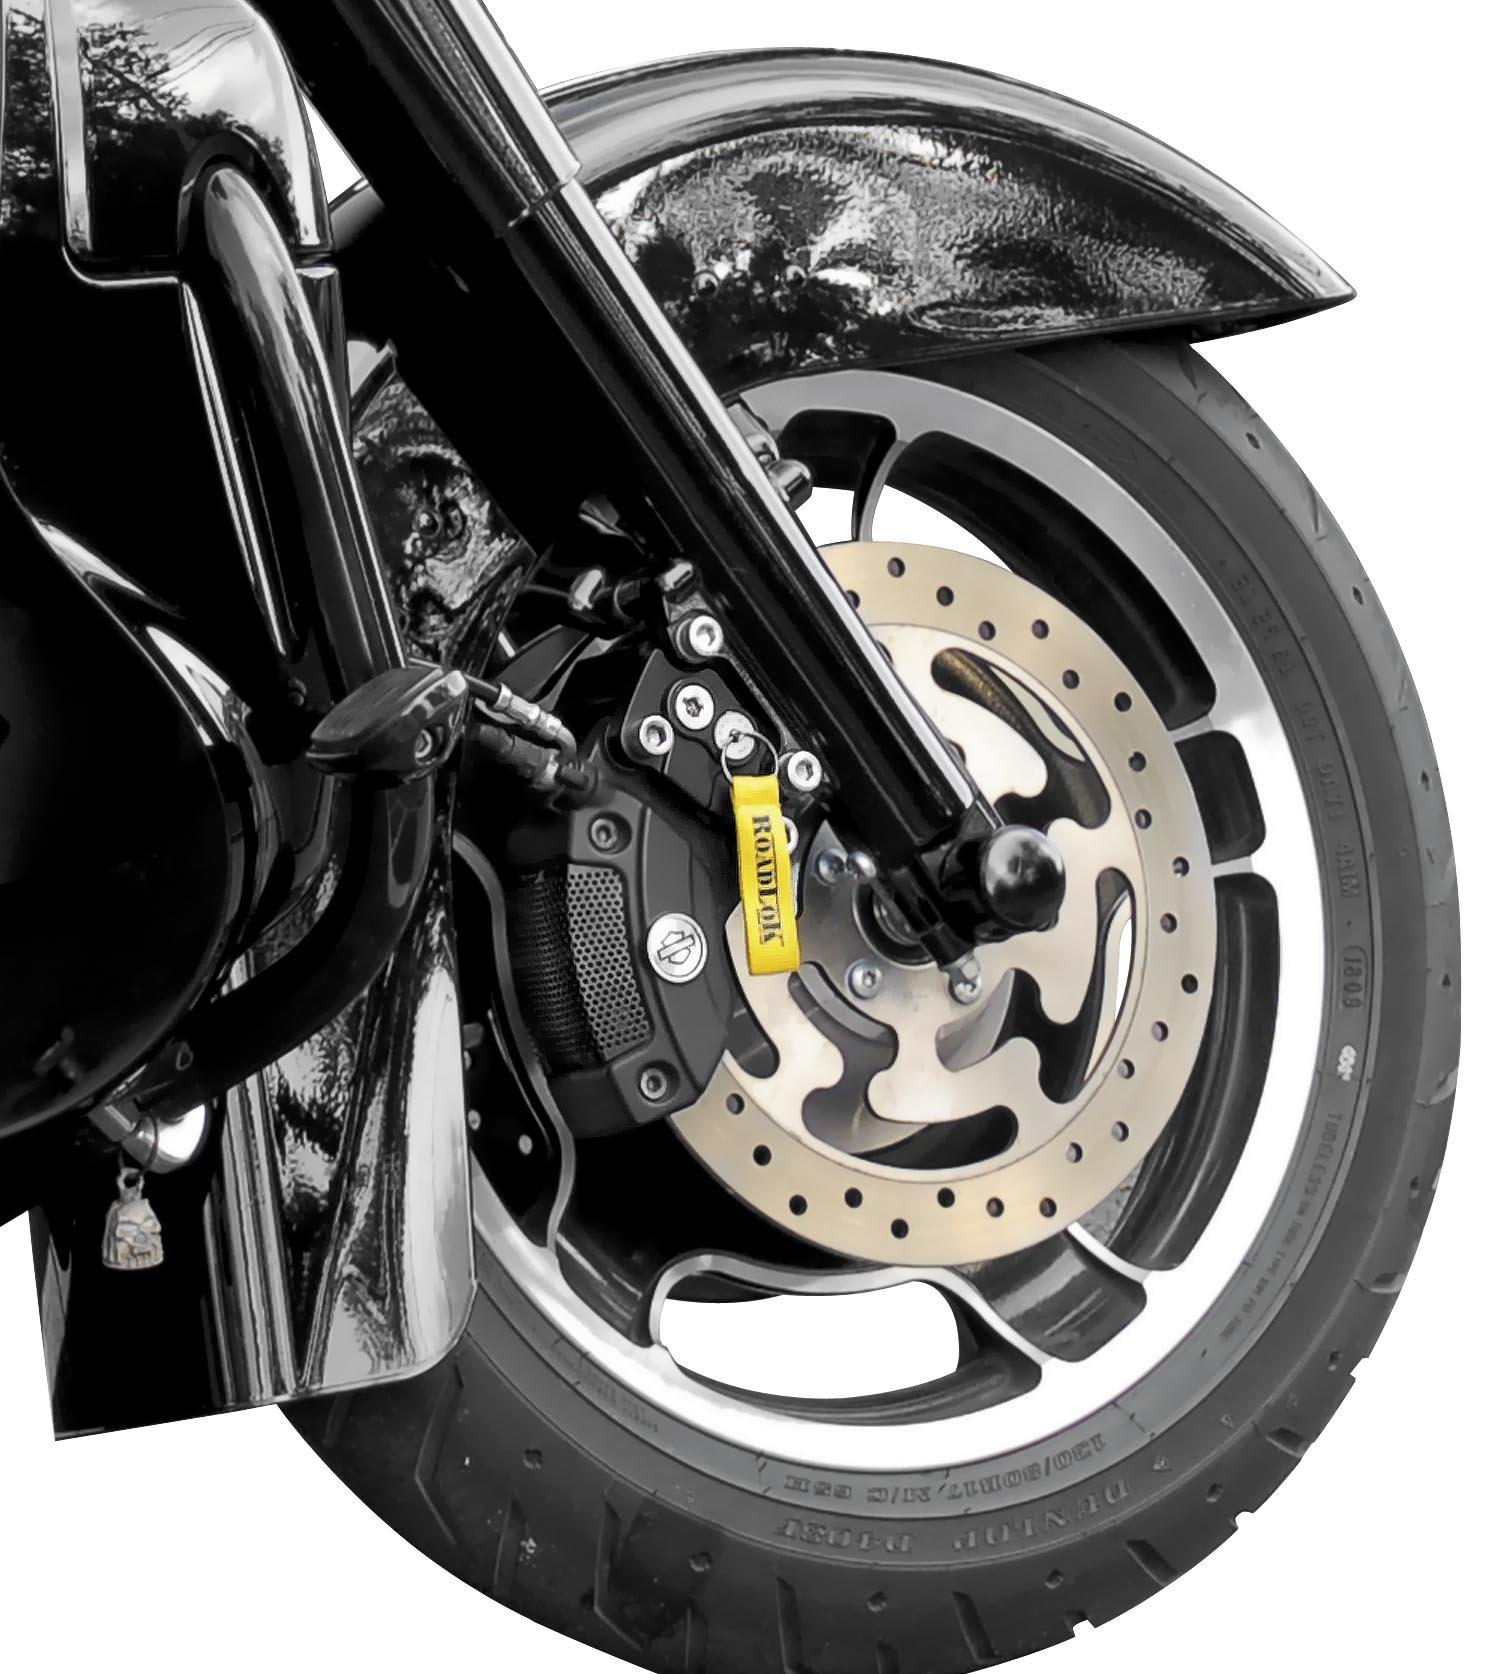 Roadlok XD Black Anti-Theft System for 2000-2010 Harley Davidson FLH/FLT